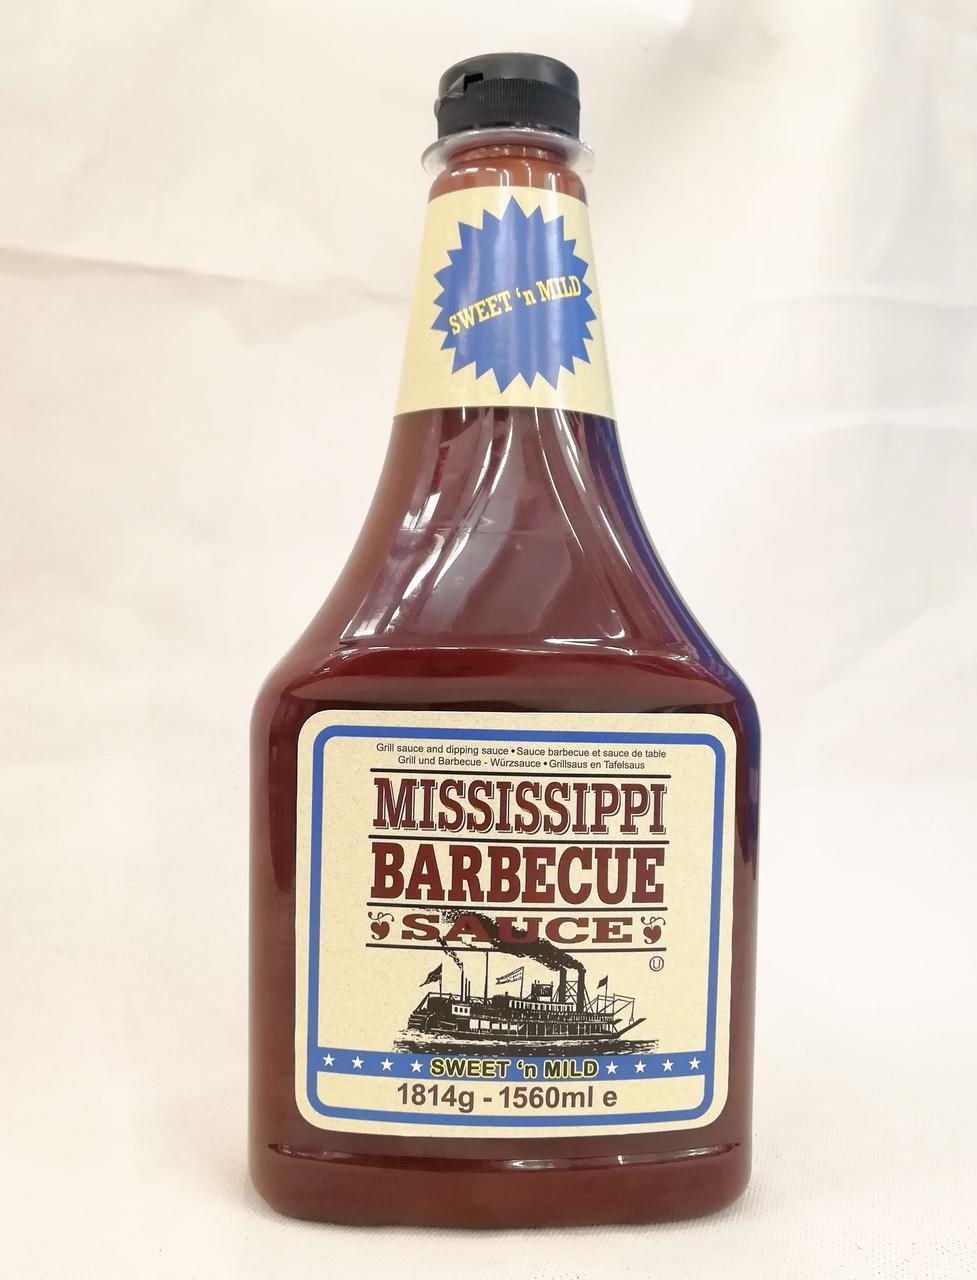 Mississippi Barbecue Sauce Sweet n Mild Соус Барбекю 1560ml